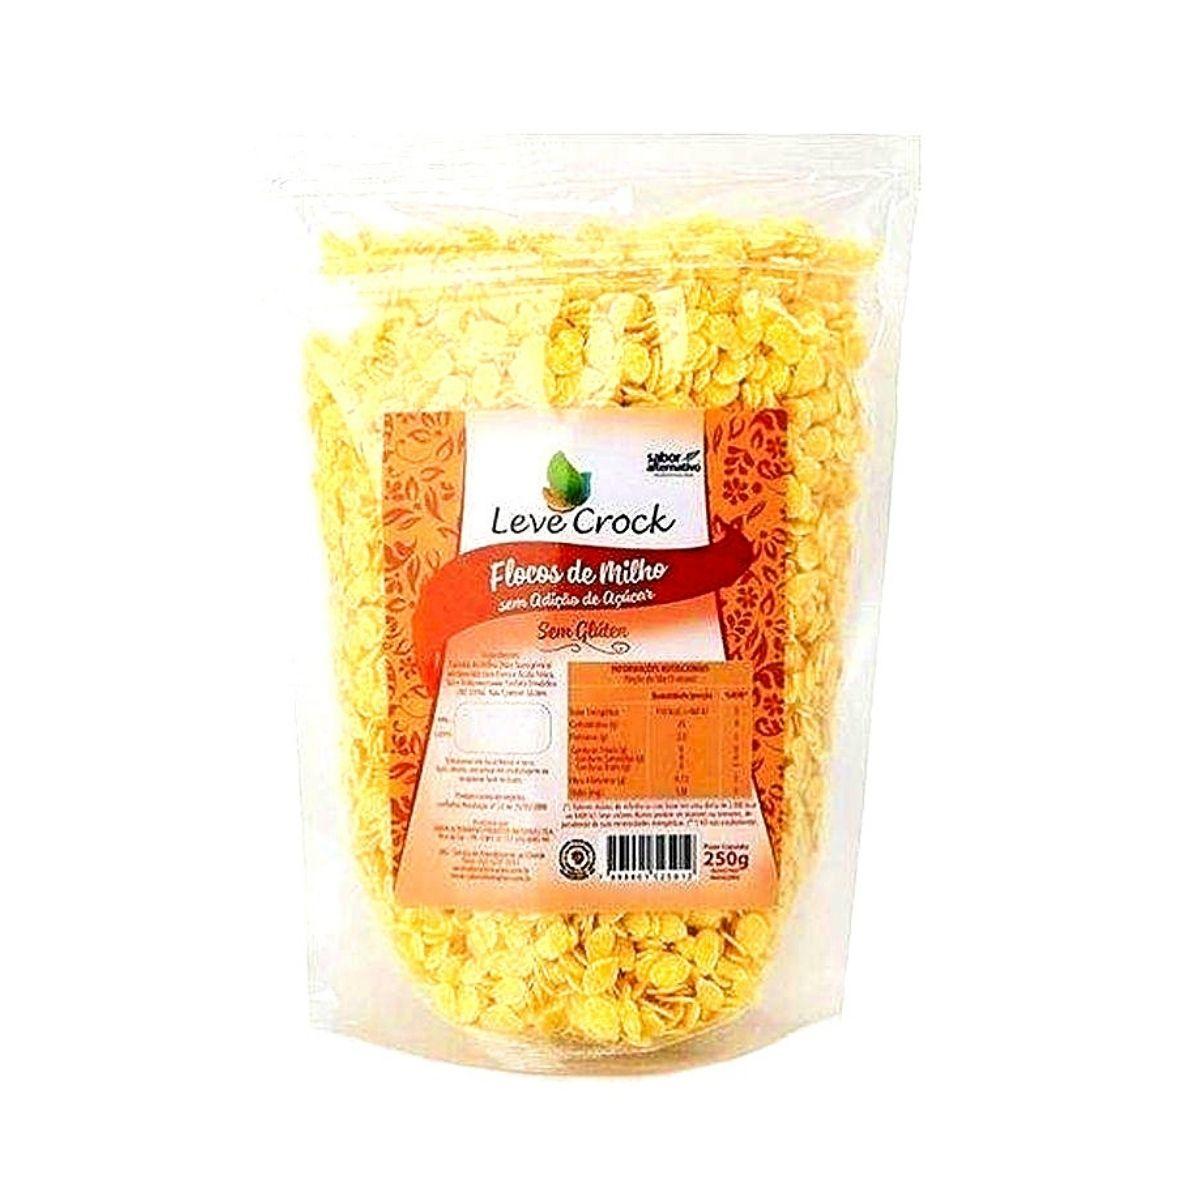 Flocos de milho 250g - leve crock